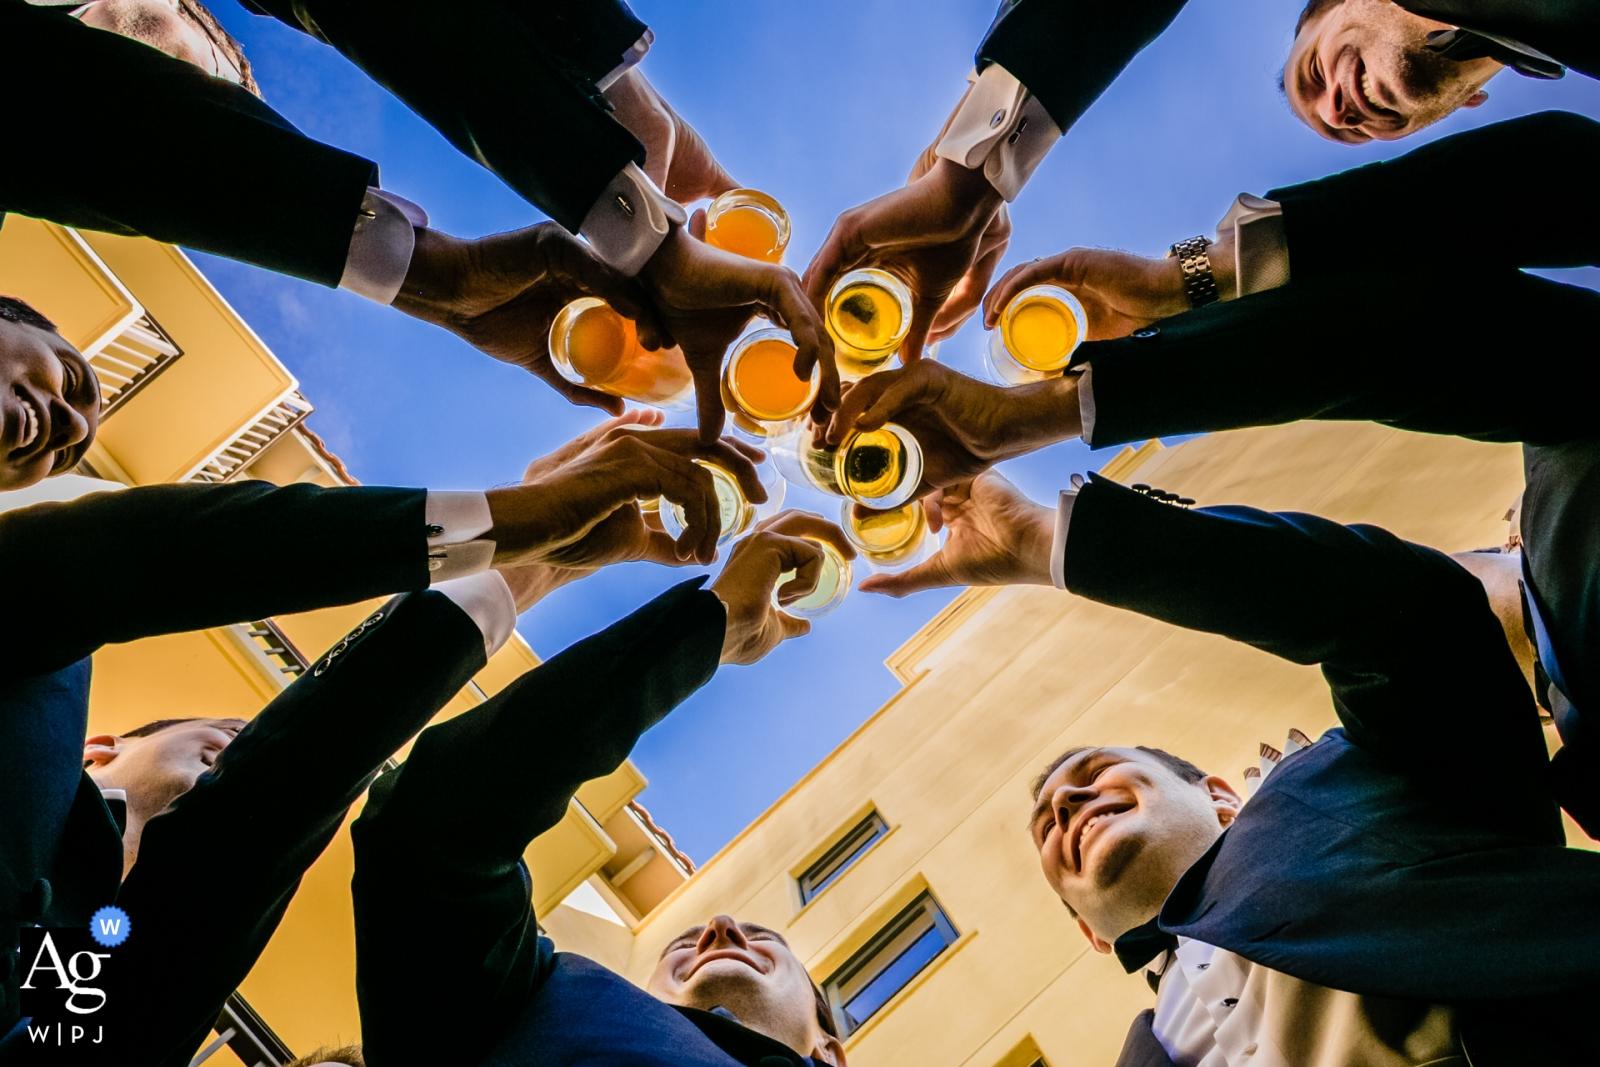 Palos Verdes, California wedding photographer - Groomsmen Cheers, a toast shot from down below